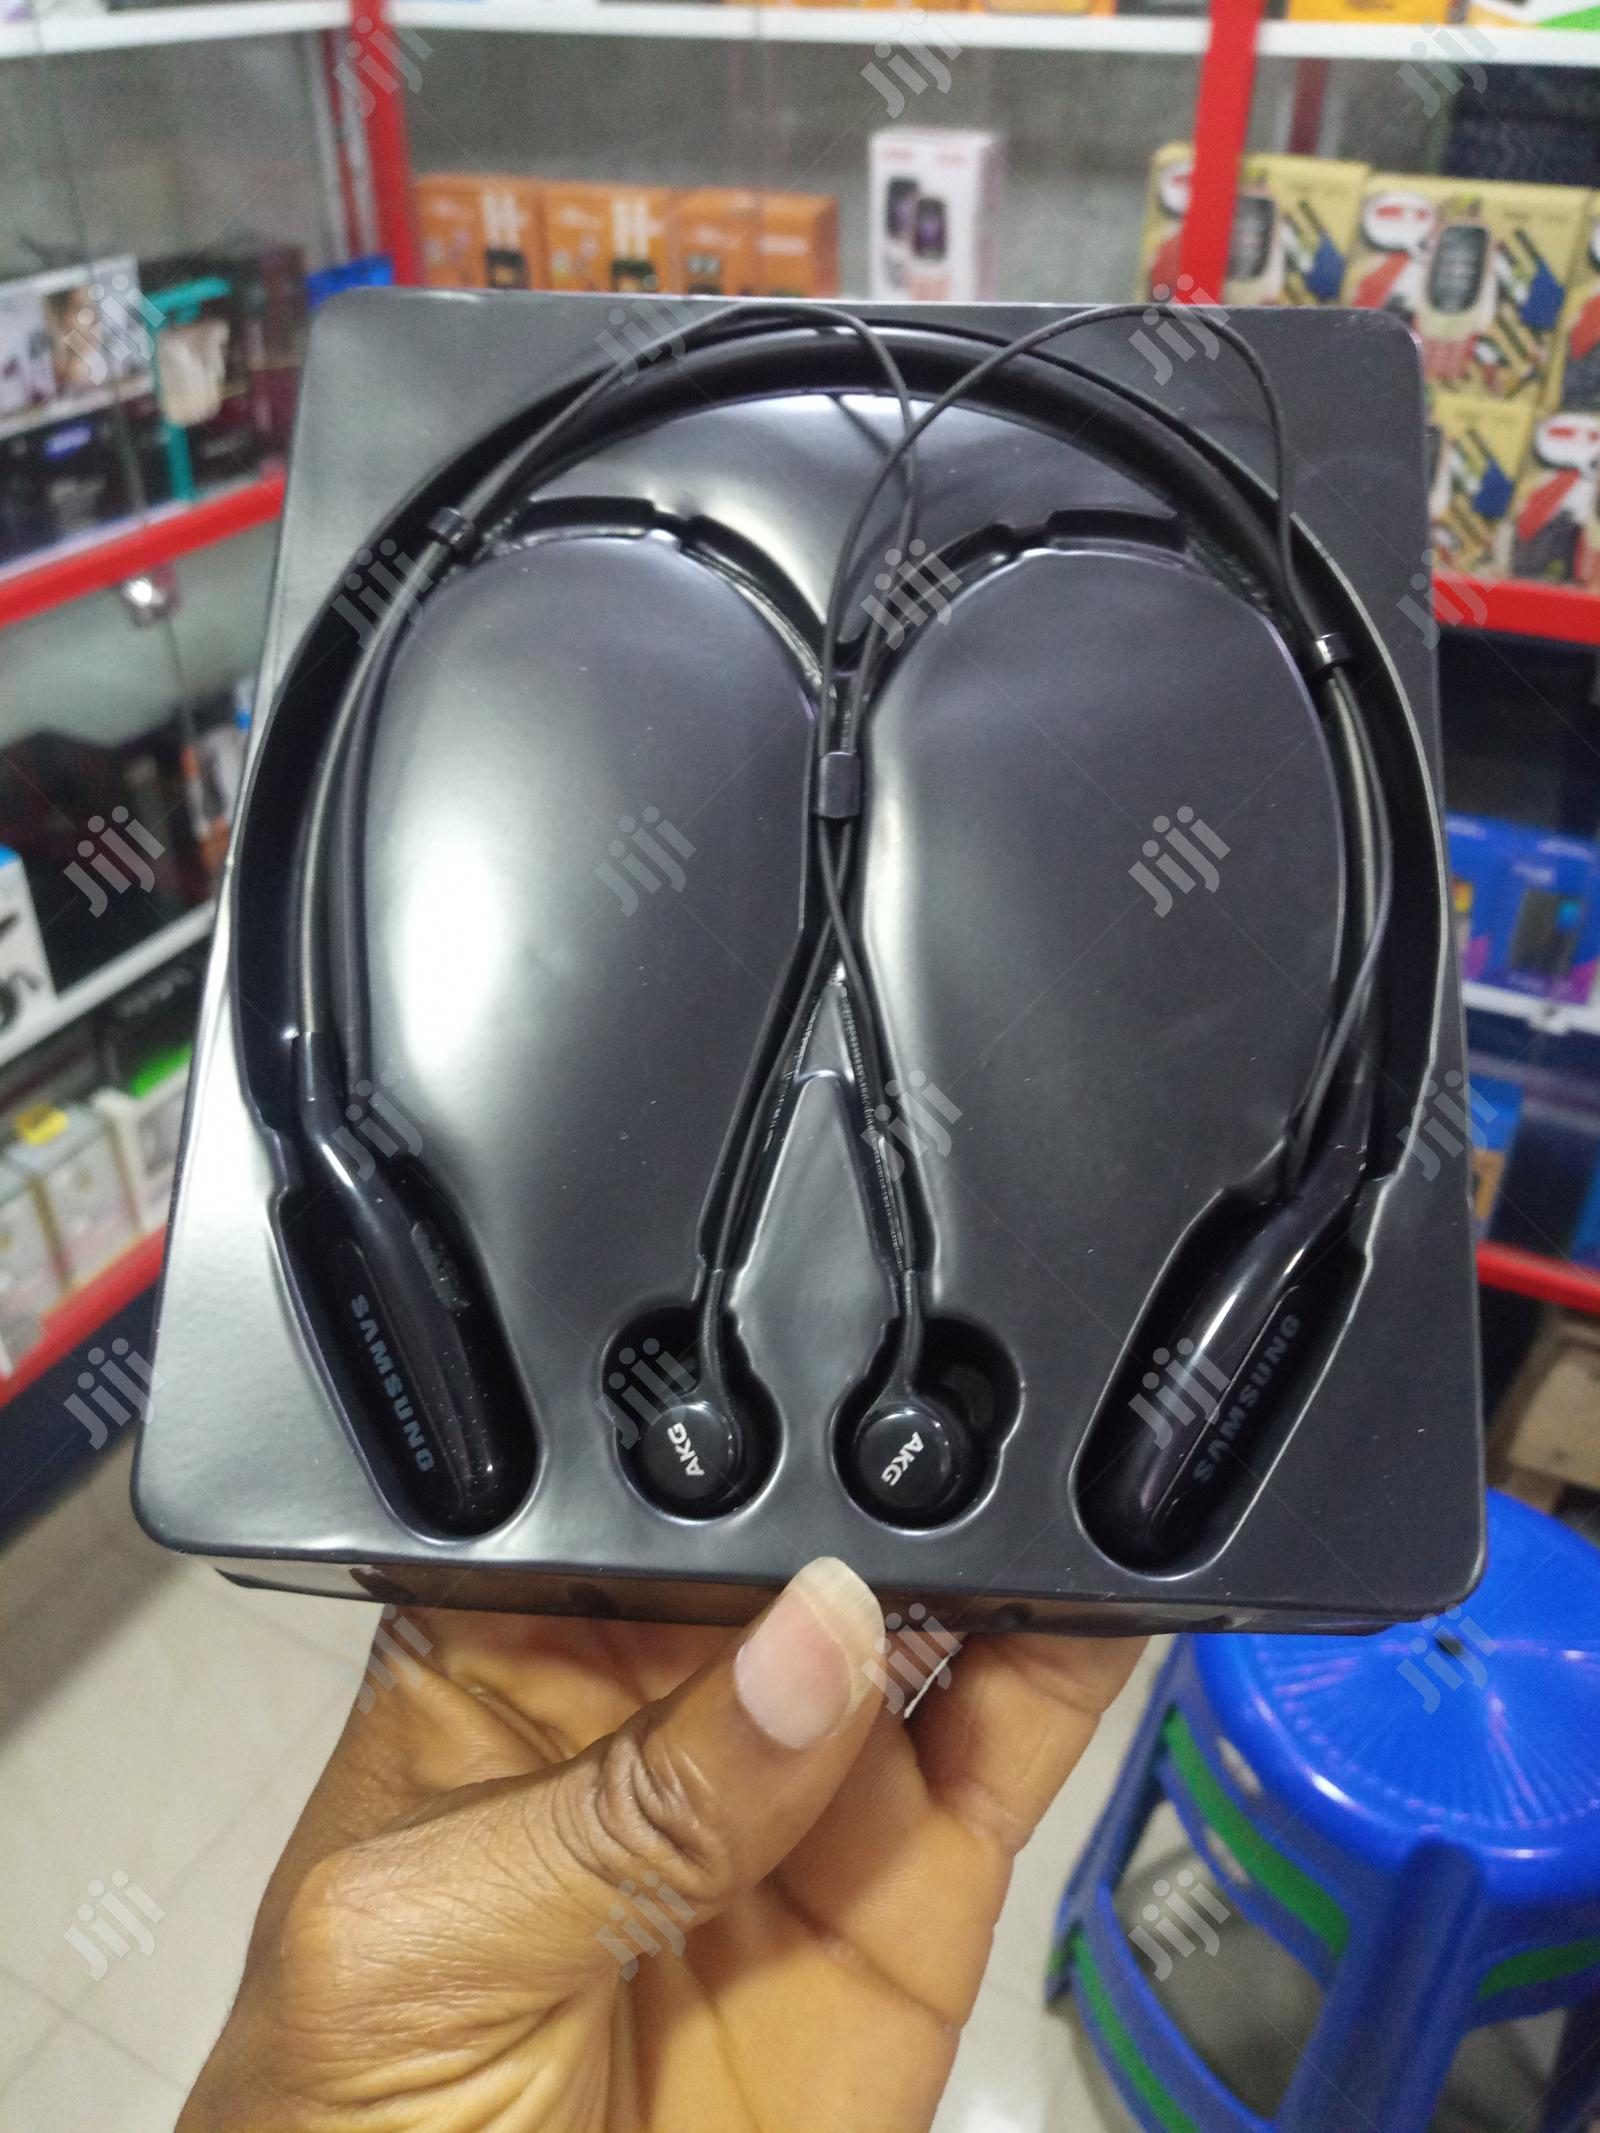 Samsung AKG 100 Wireless Stereo Earbuds | Headphones for sale in Ikeja, Lagos State, Nigeria